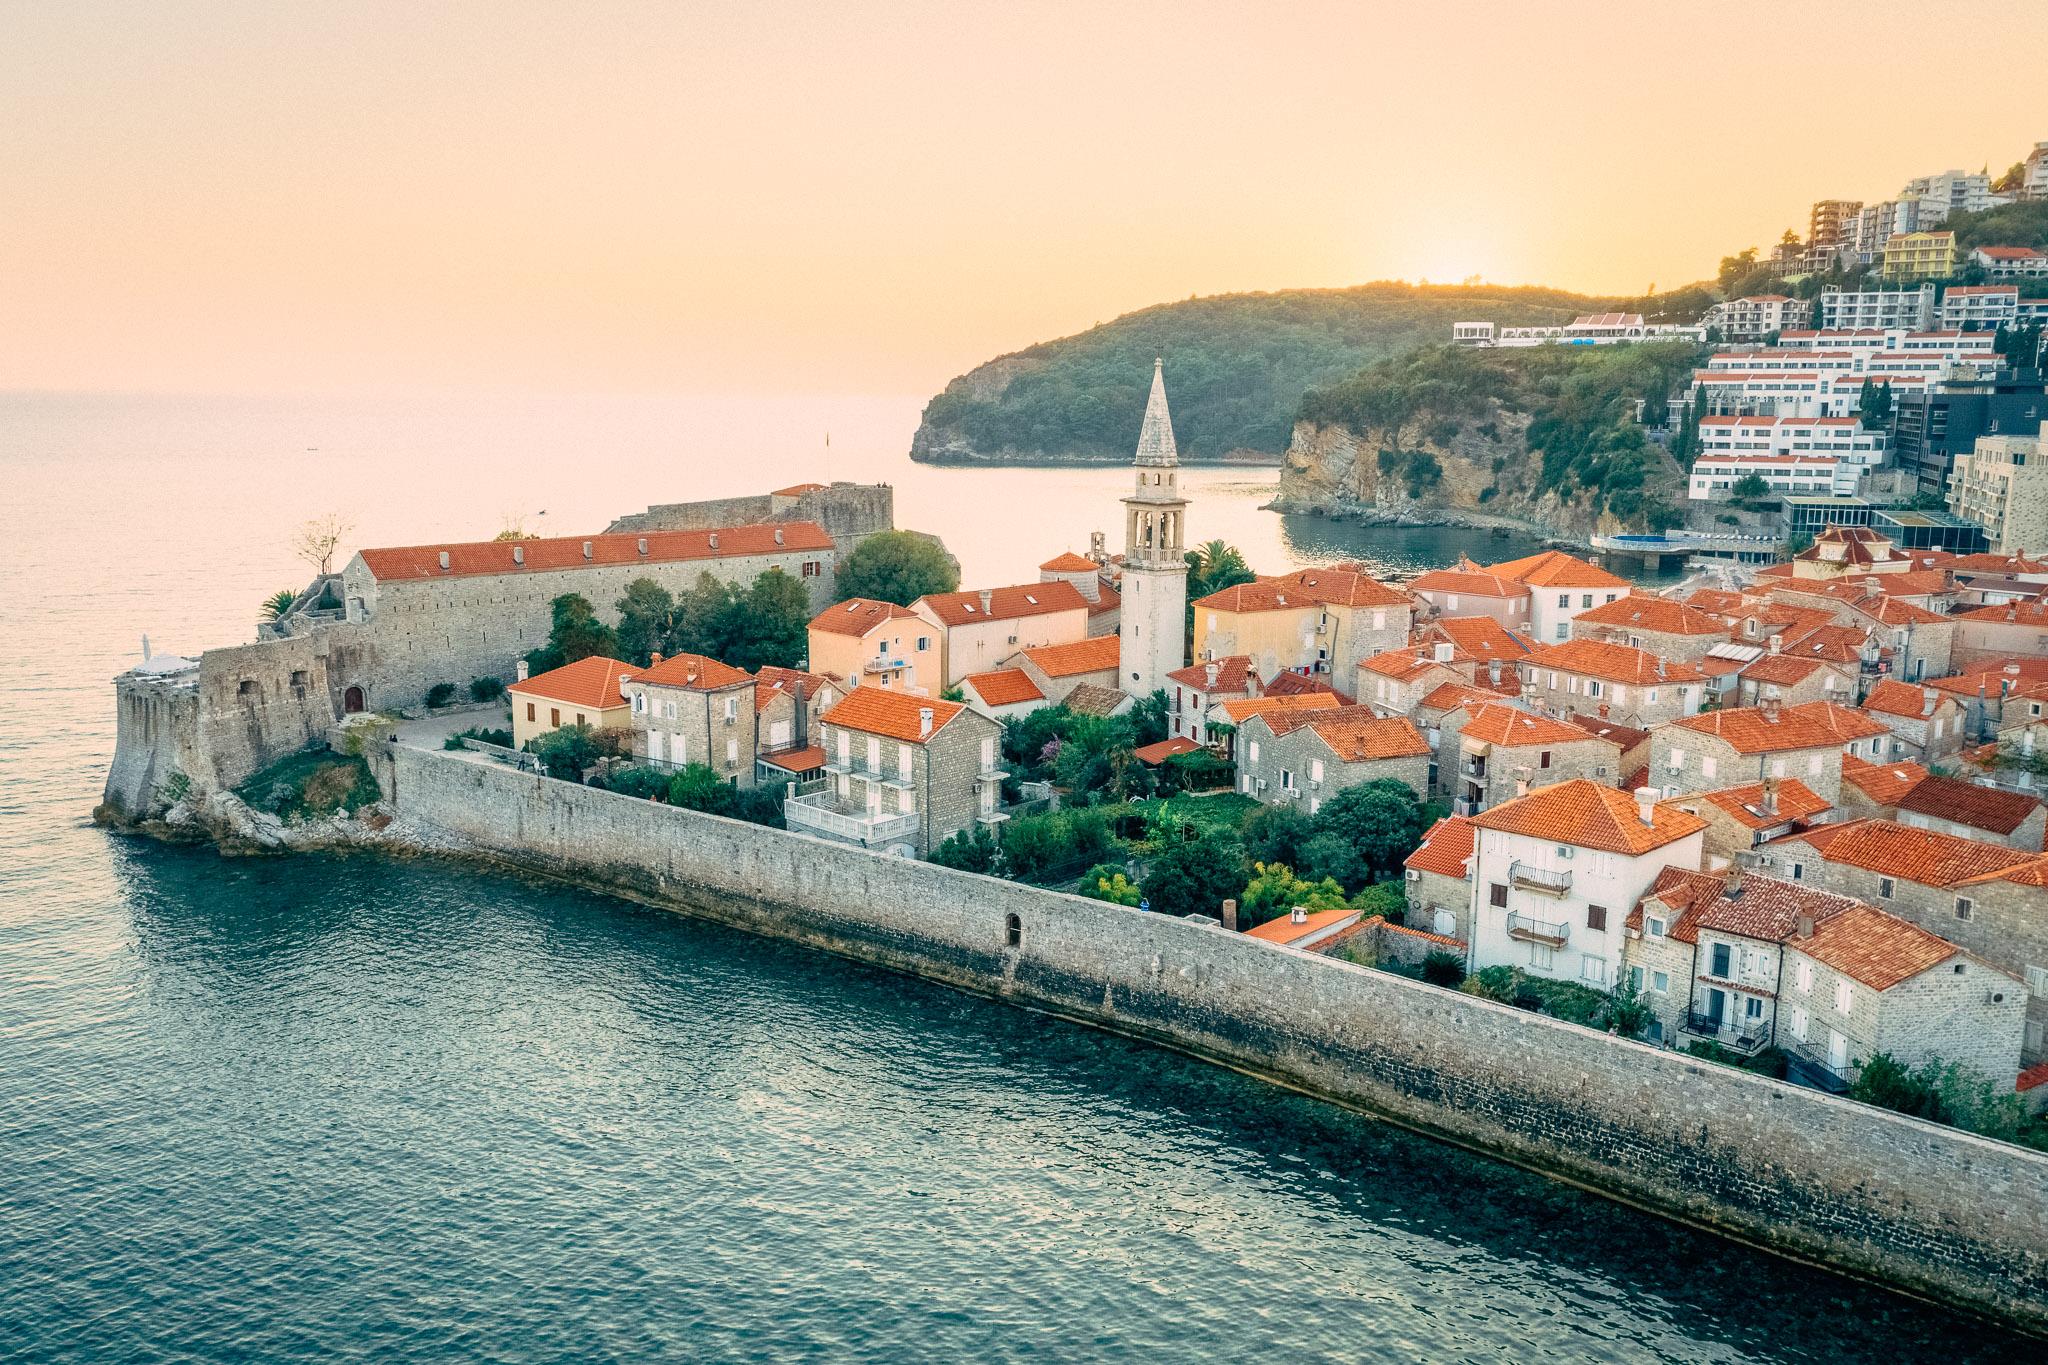 PJ Rankin_Drop in the Ocean_Montenegro-30.jpg